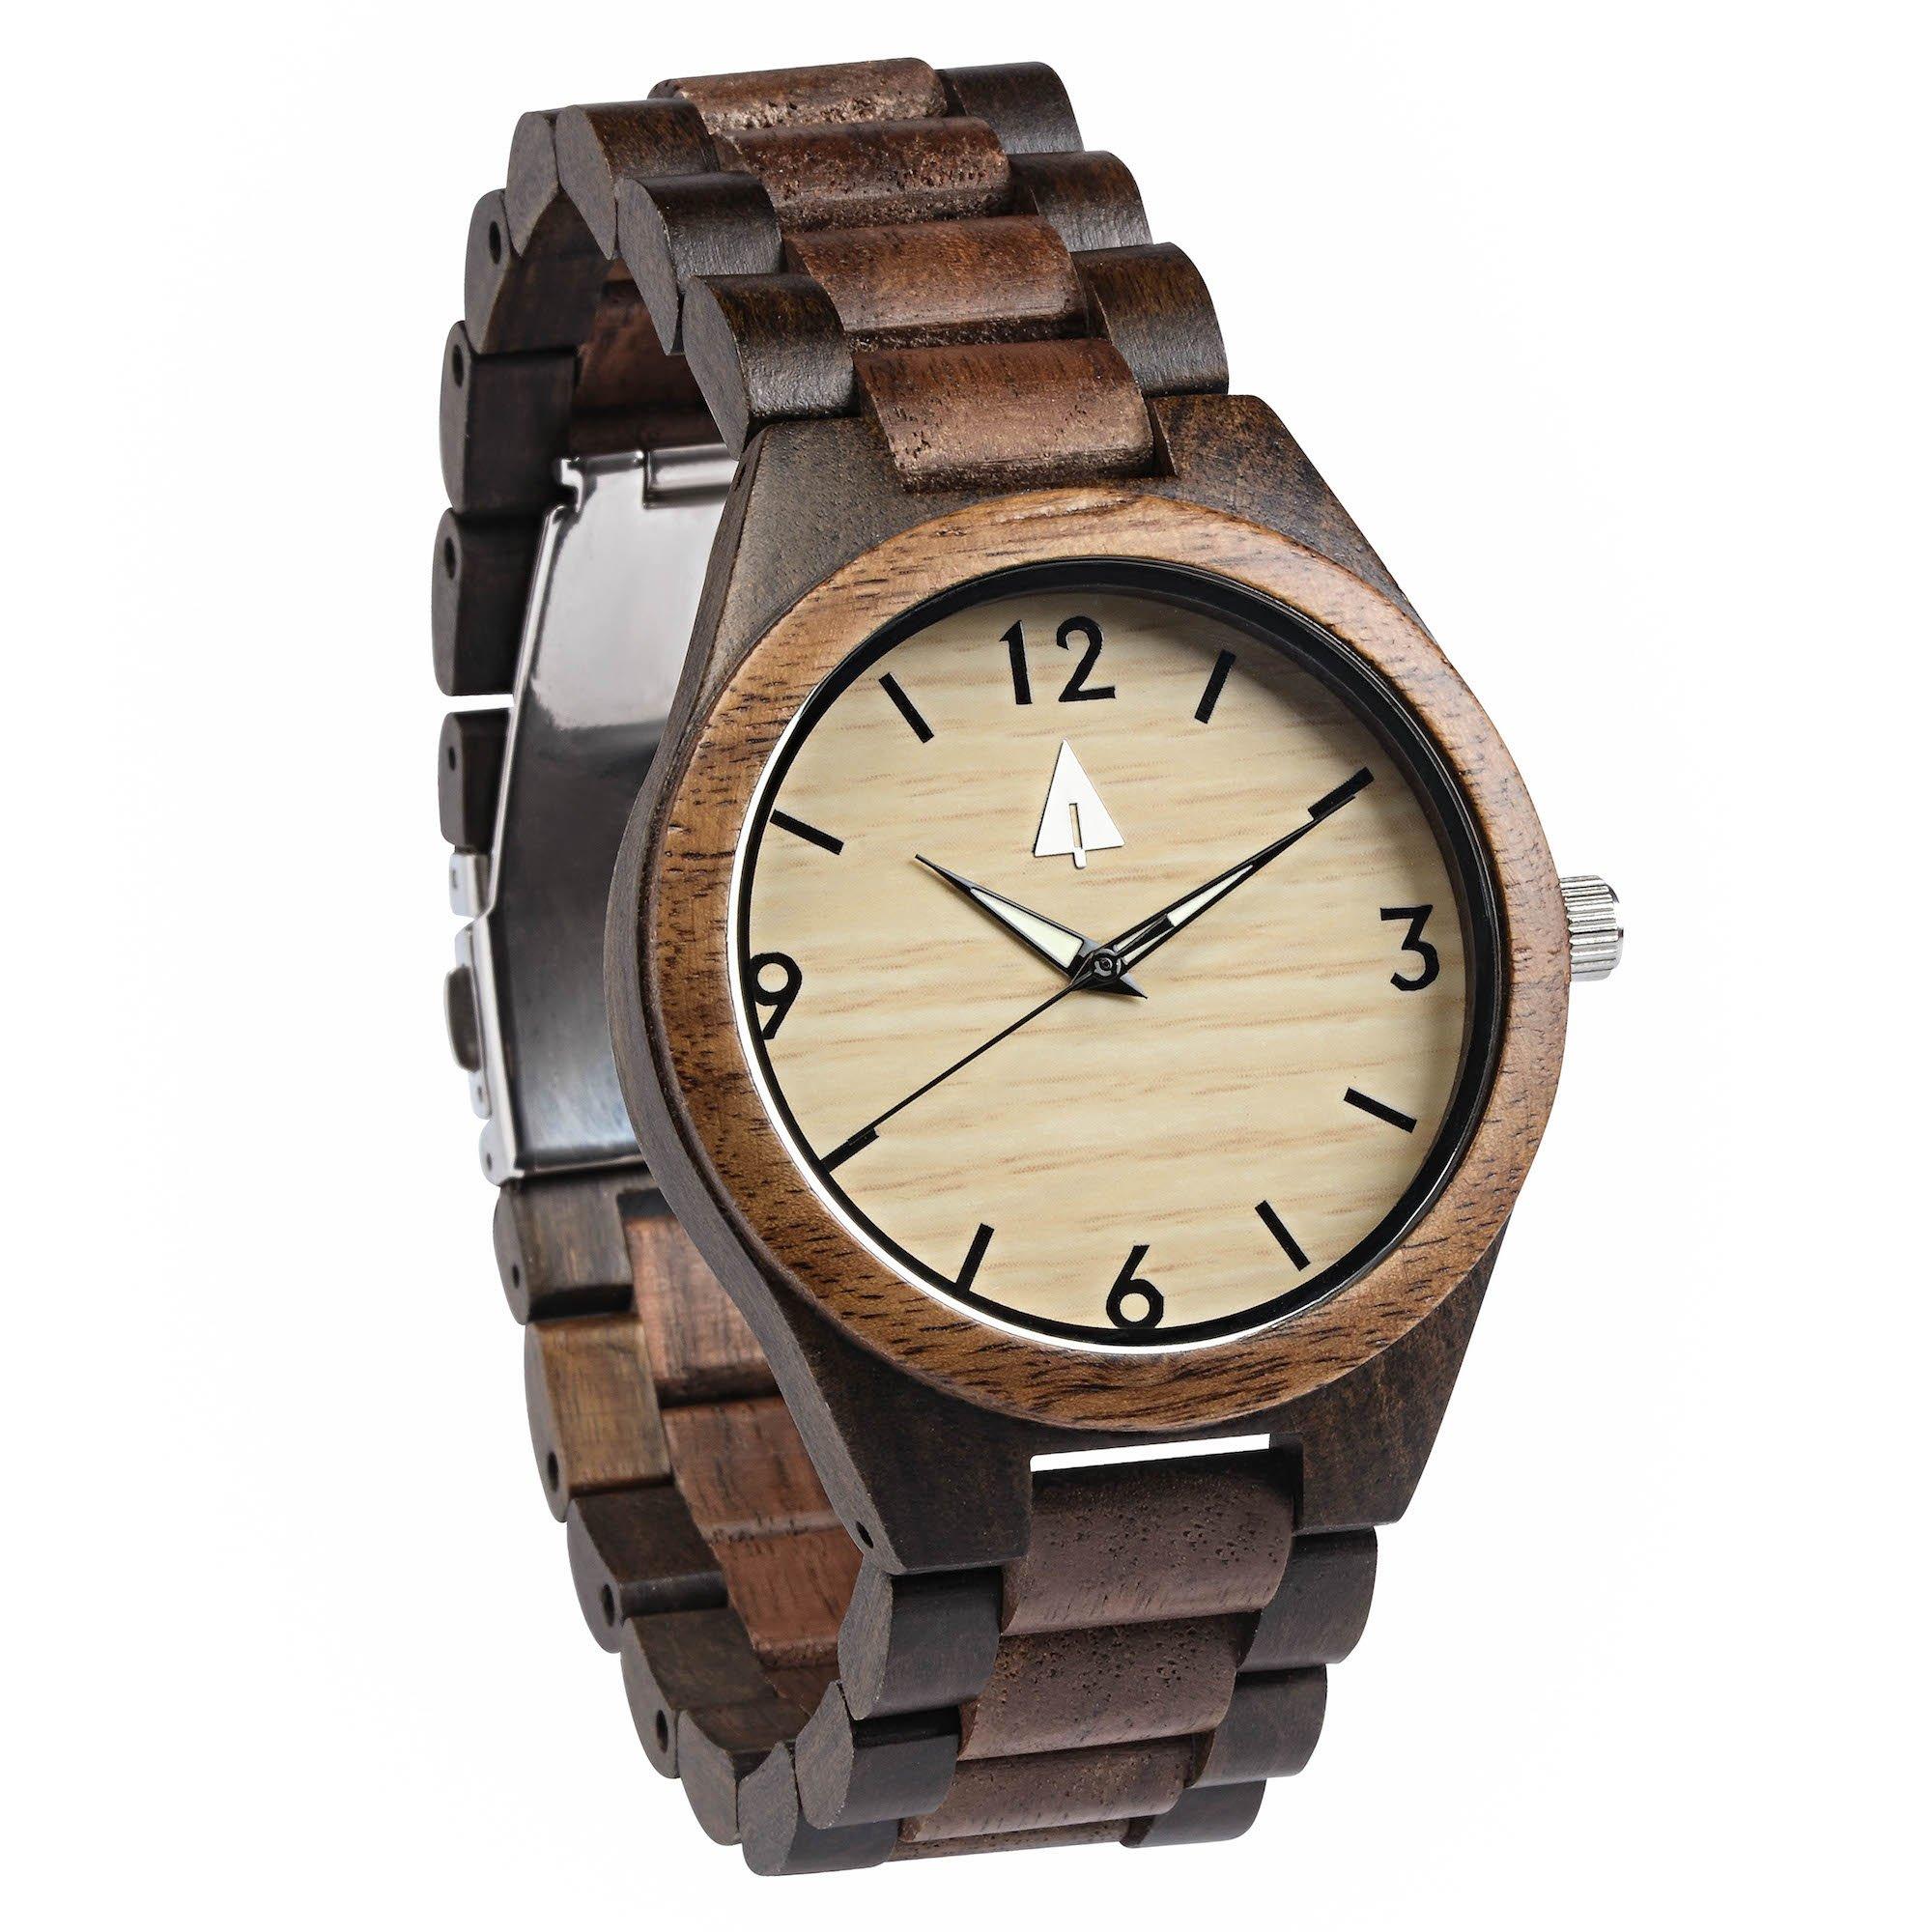 Treehut Men's Walnut and Ebony Wooden Watch with All Wood Strap Quartz Analog...